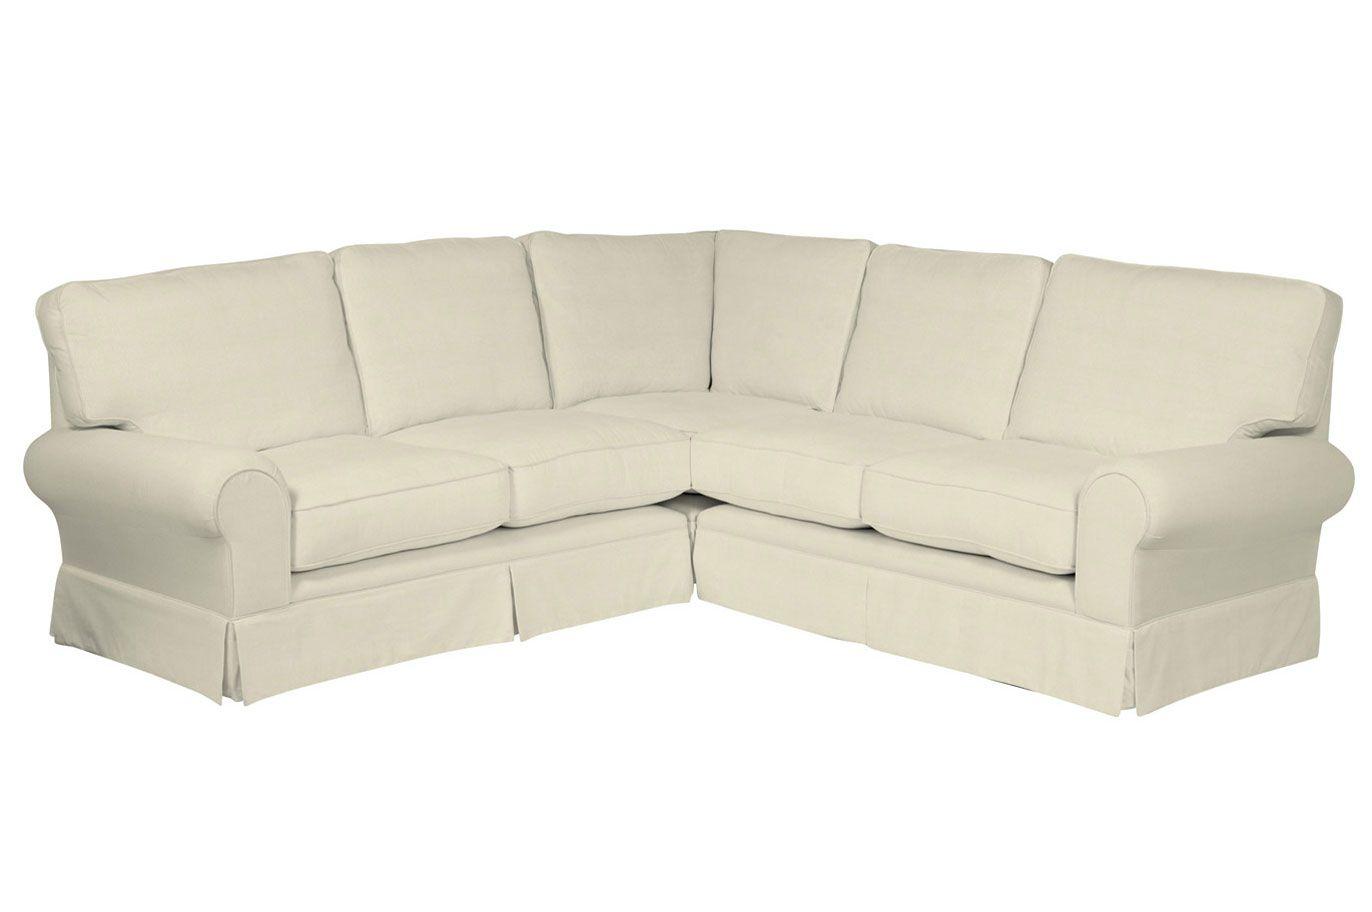 Kendal Upholstered Corner Unit Laura Ashley Made To Order Home